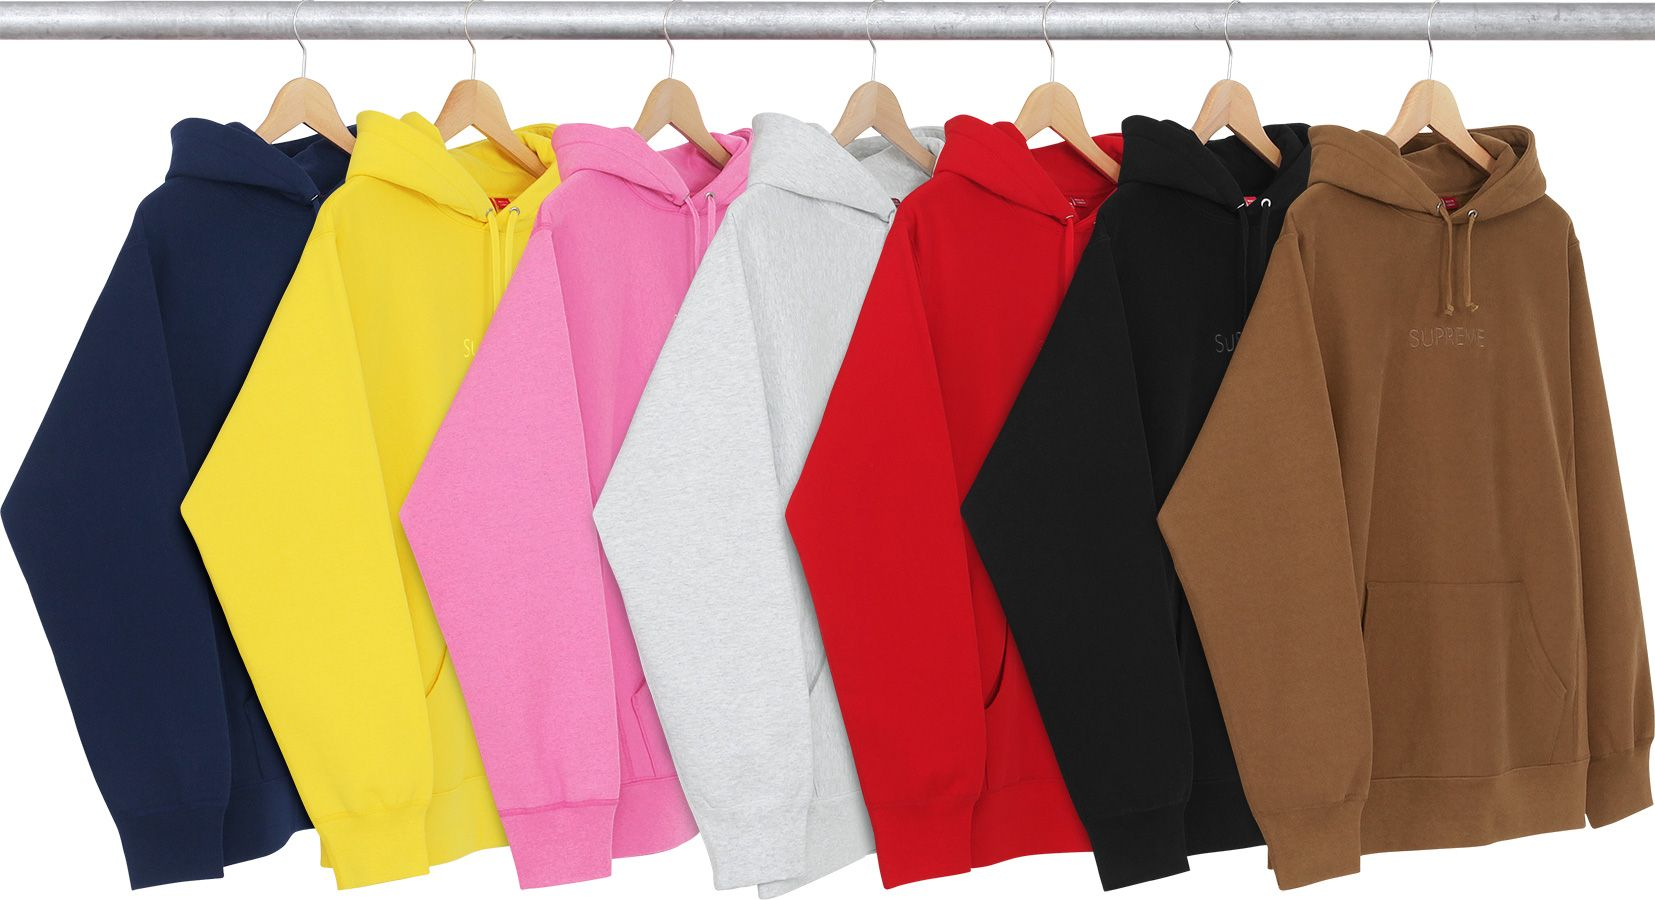 84ae0286cec8 Supreme Tonal Embroidered Hooded Sweatshirt